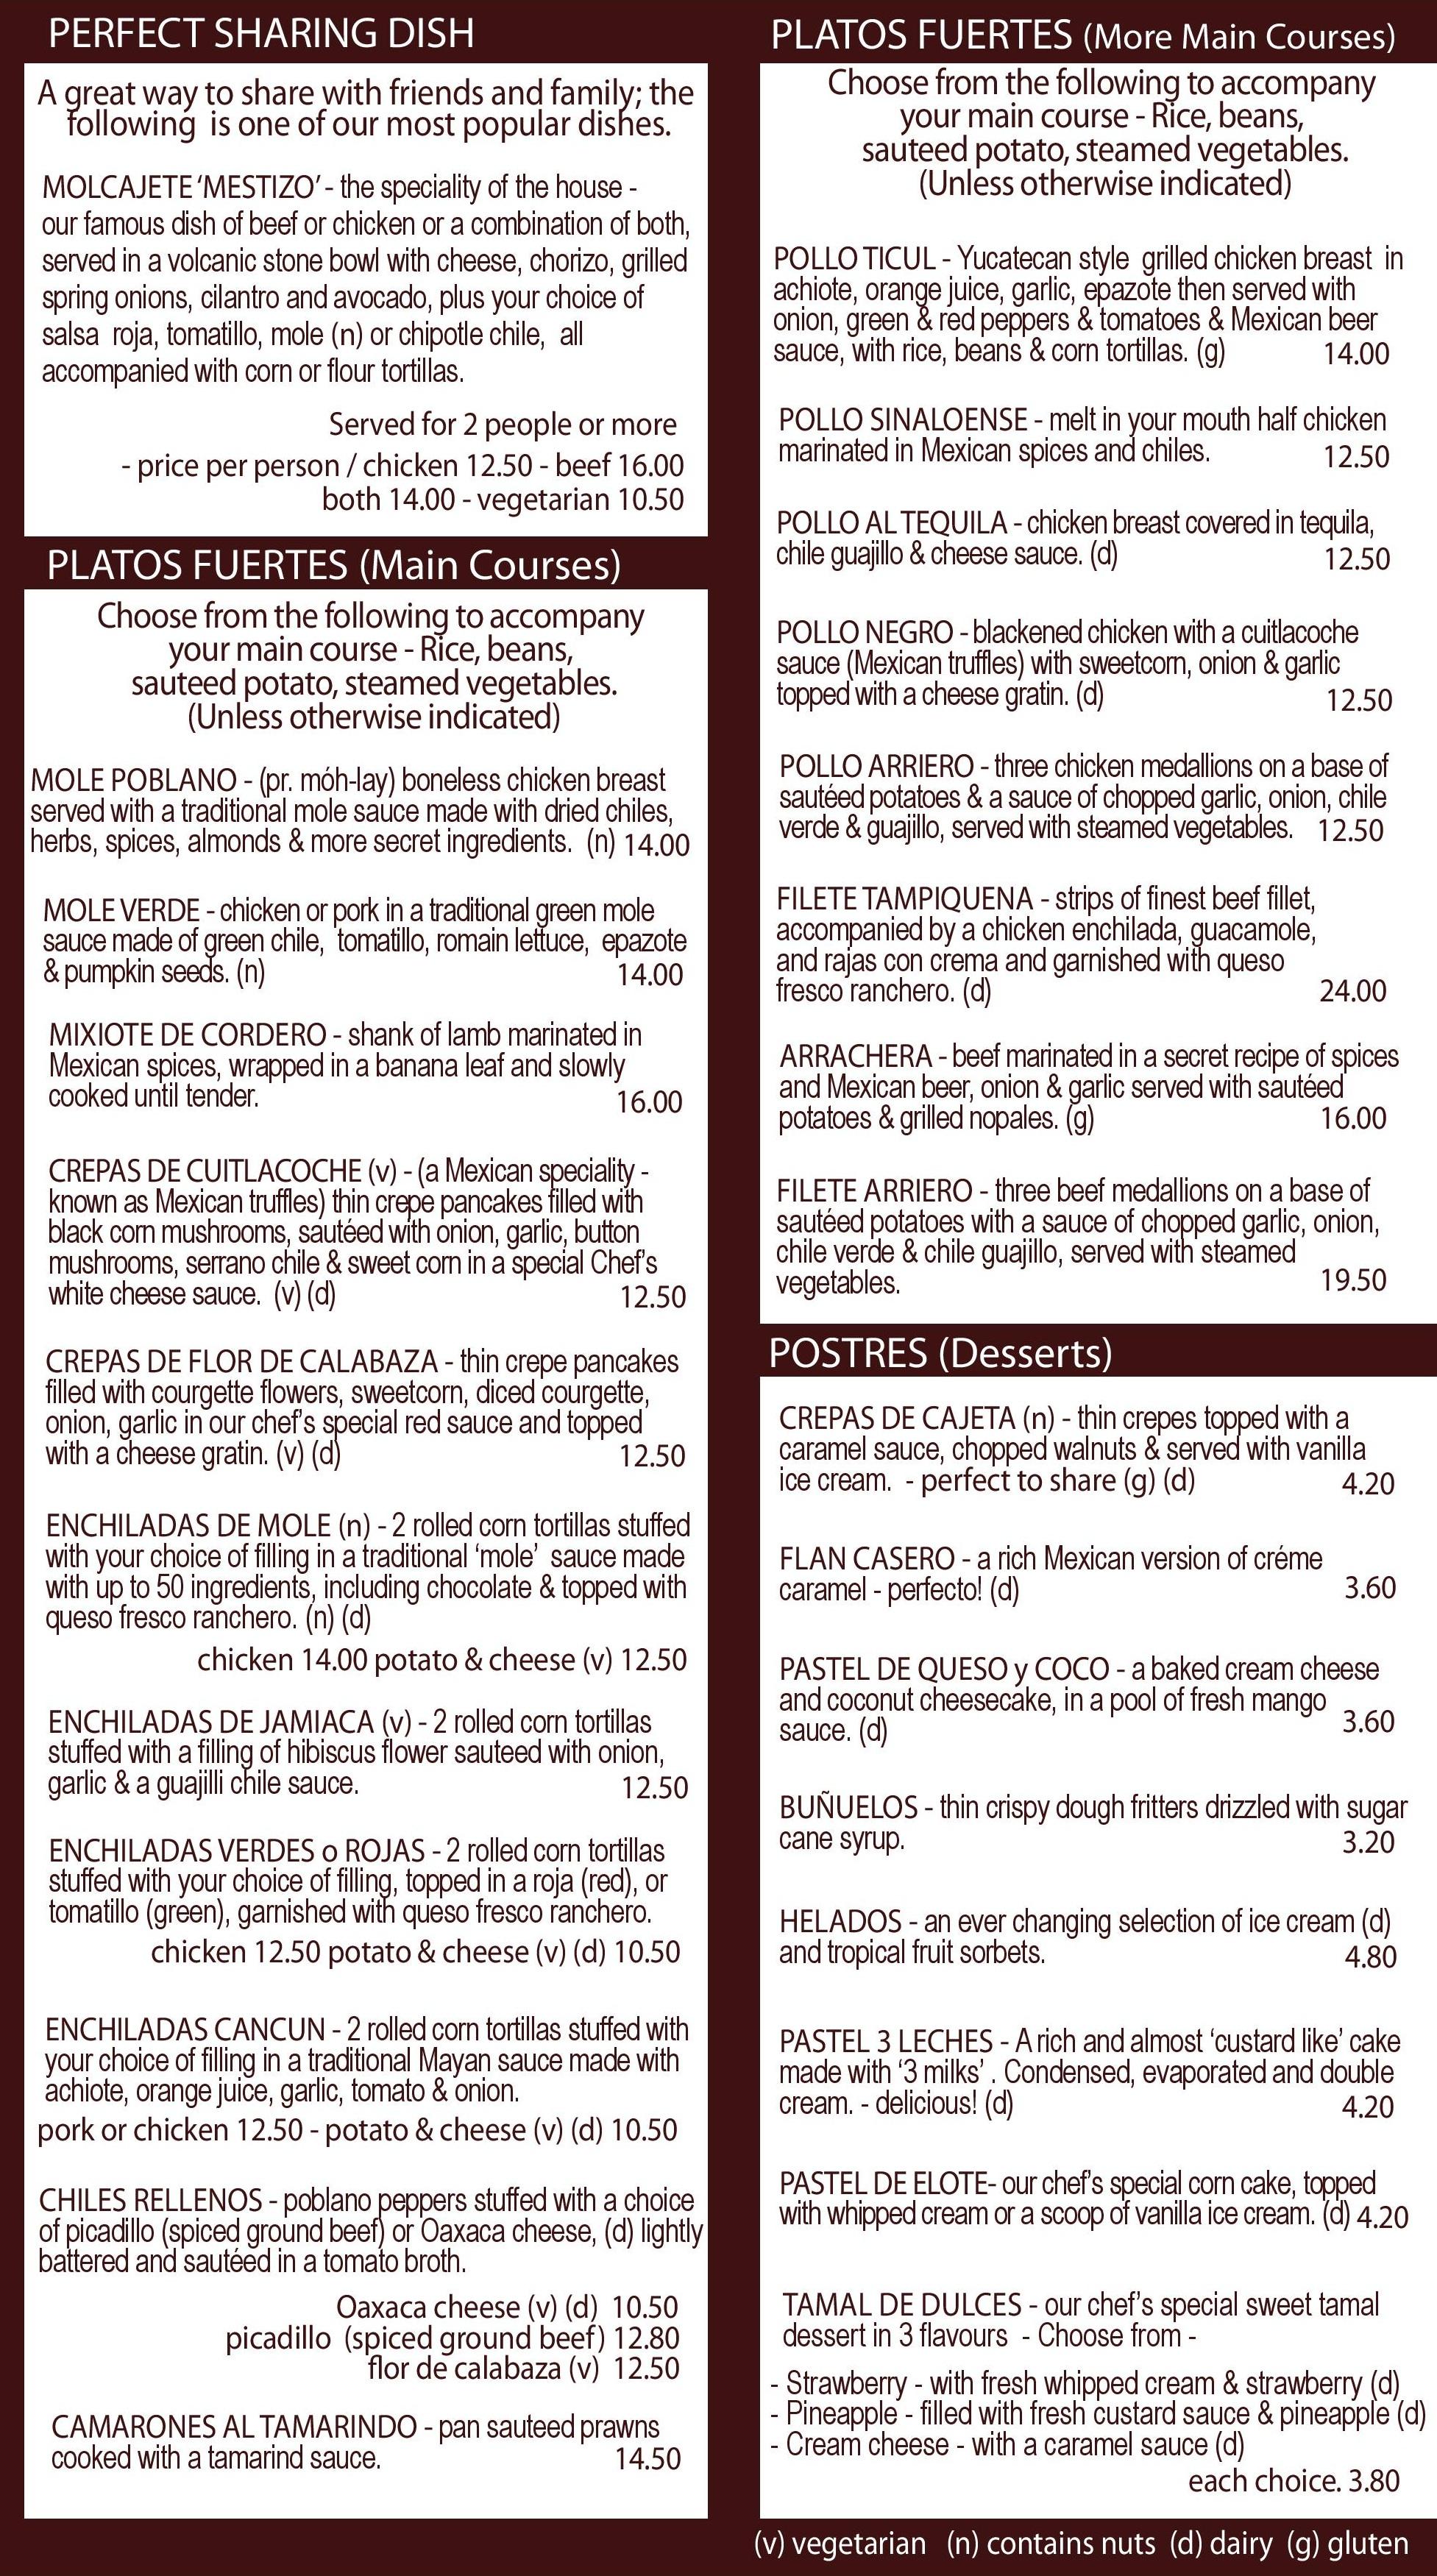 Final menu part 2